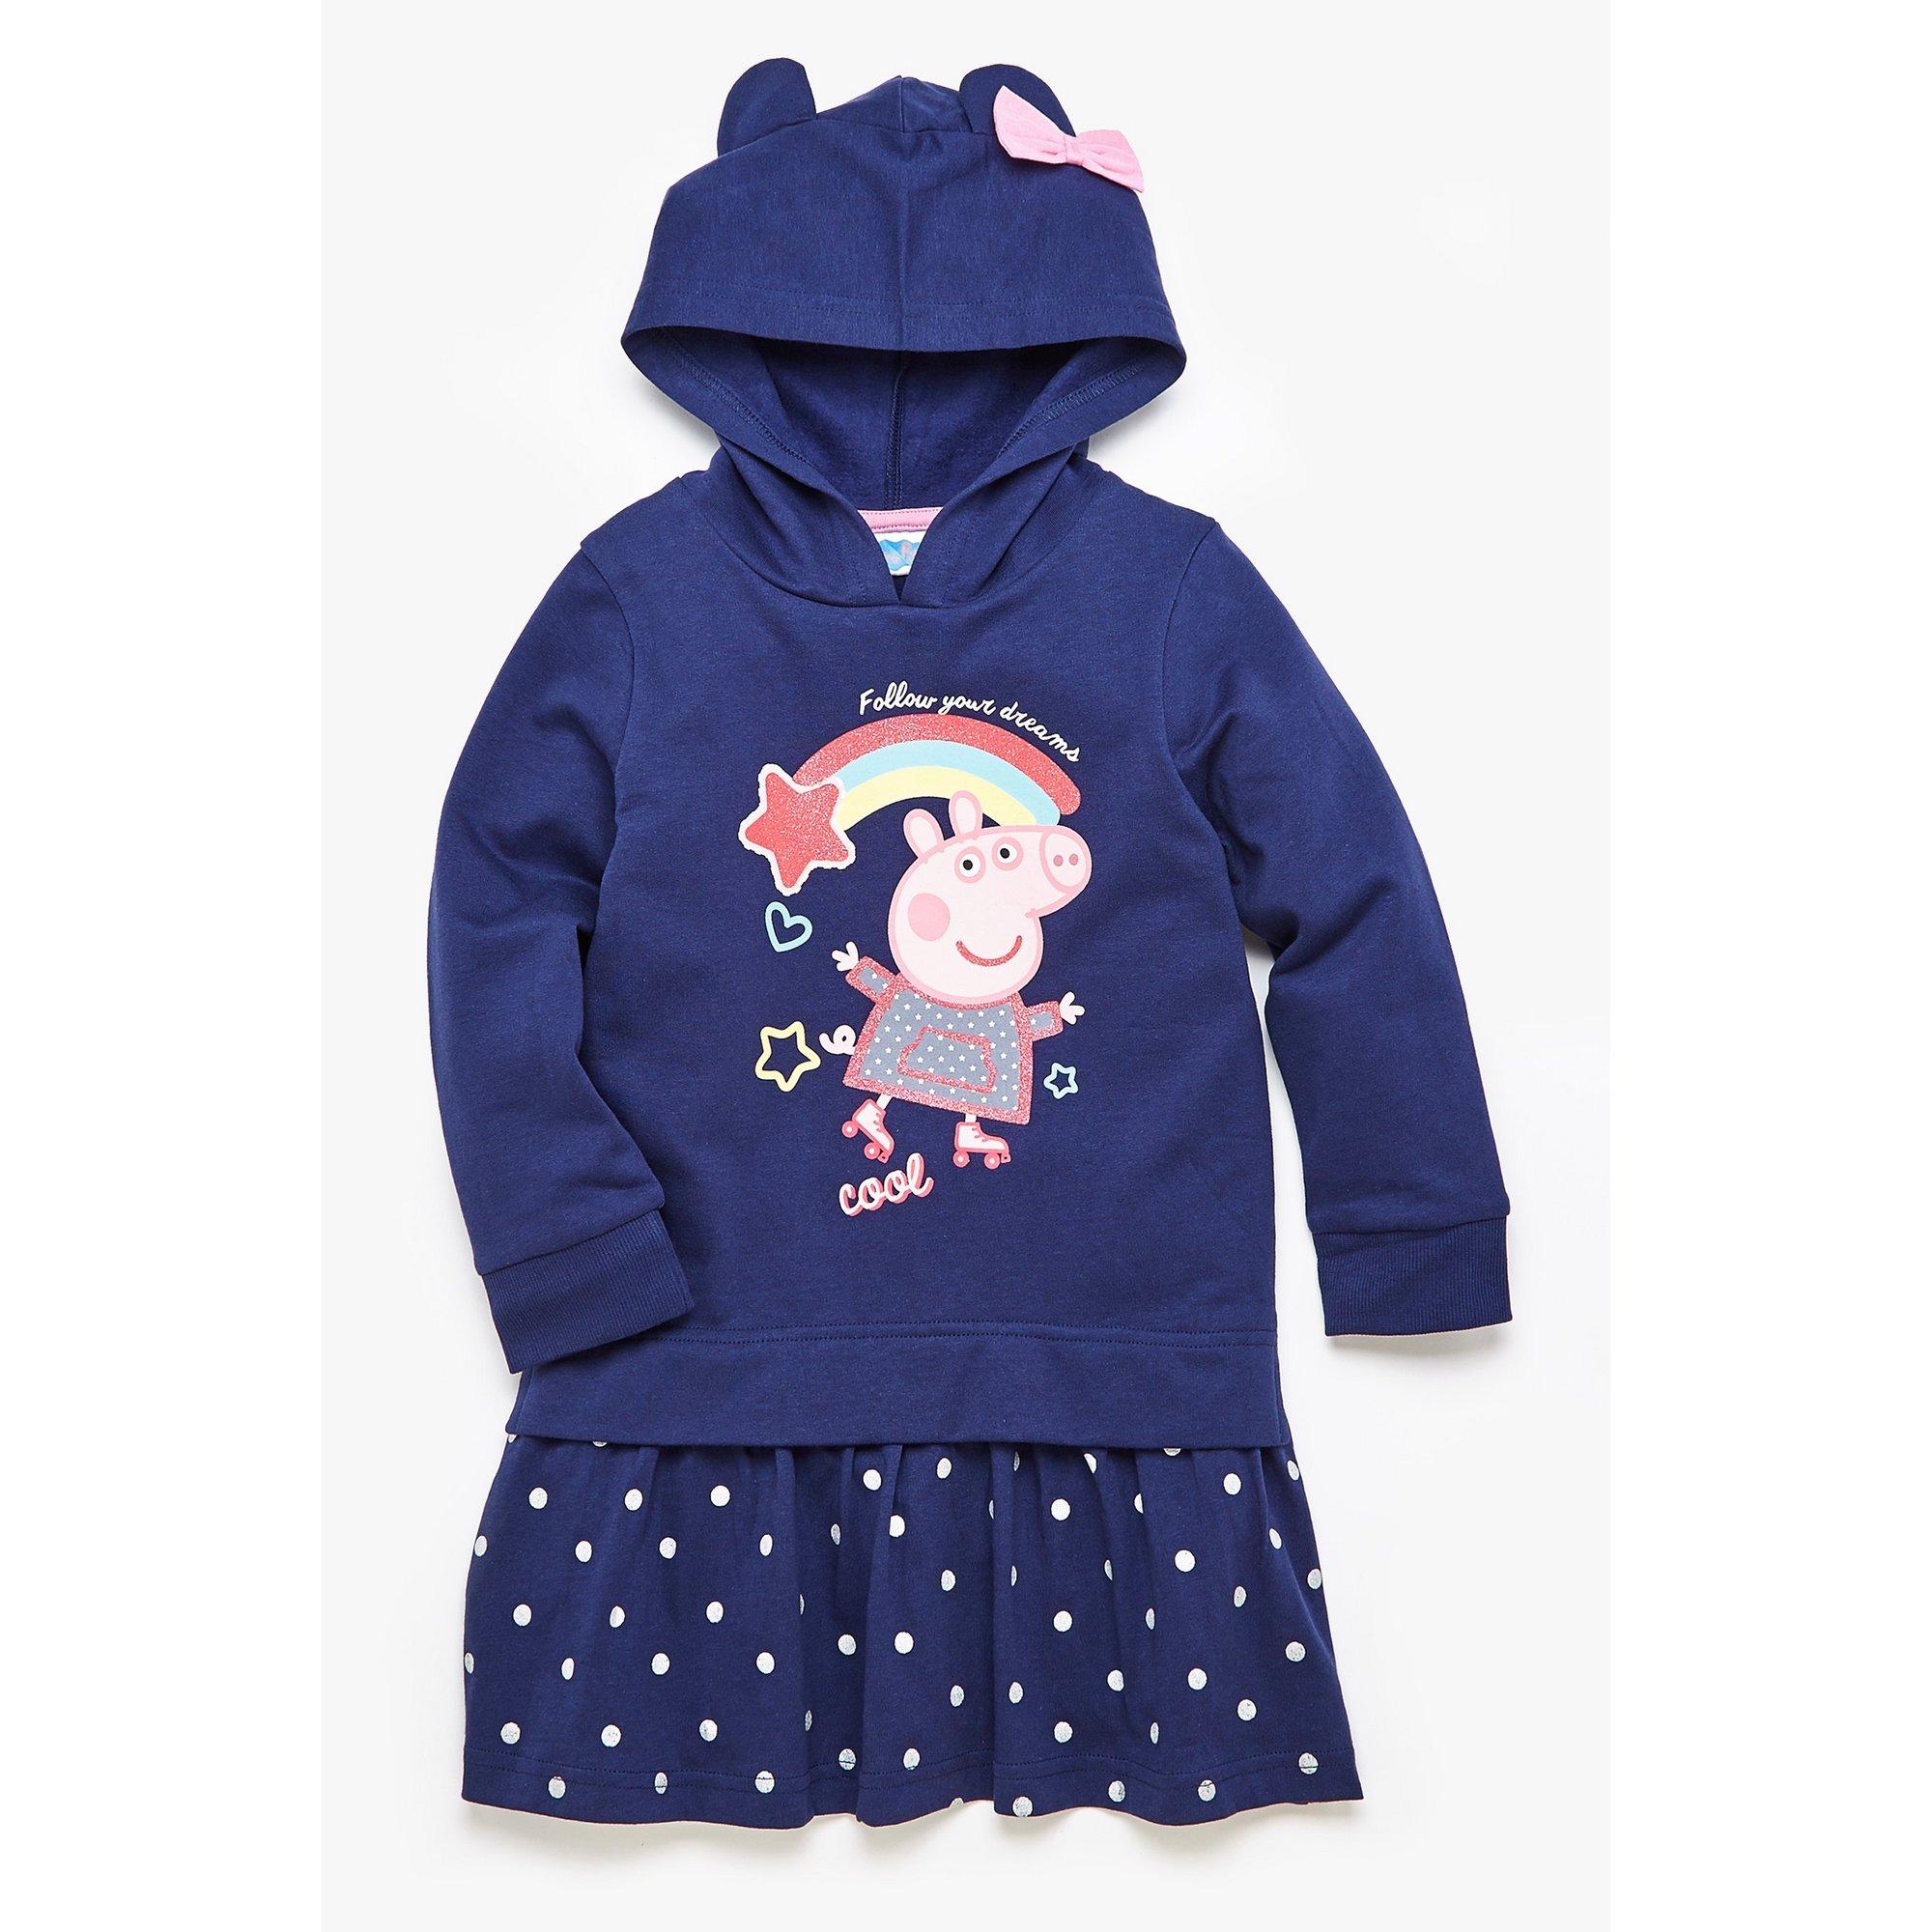 Image of Girls Peppa Pig Navy Hooded Sweatdress